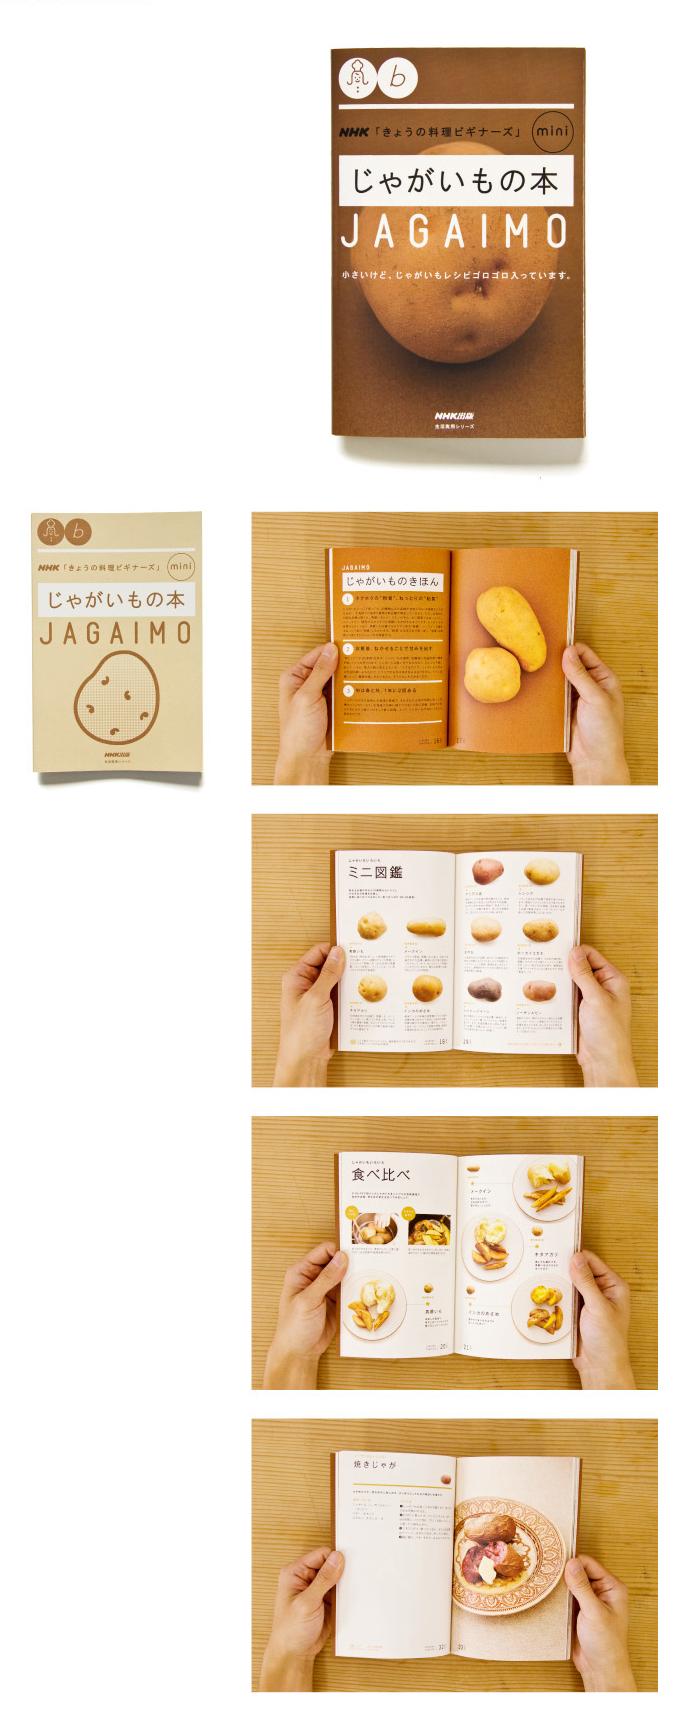 NHK「きょうの料理ビギナーズ」mini じゃがいもの本